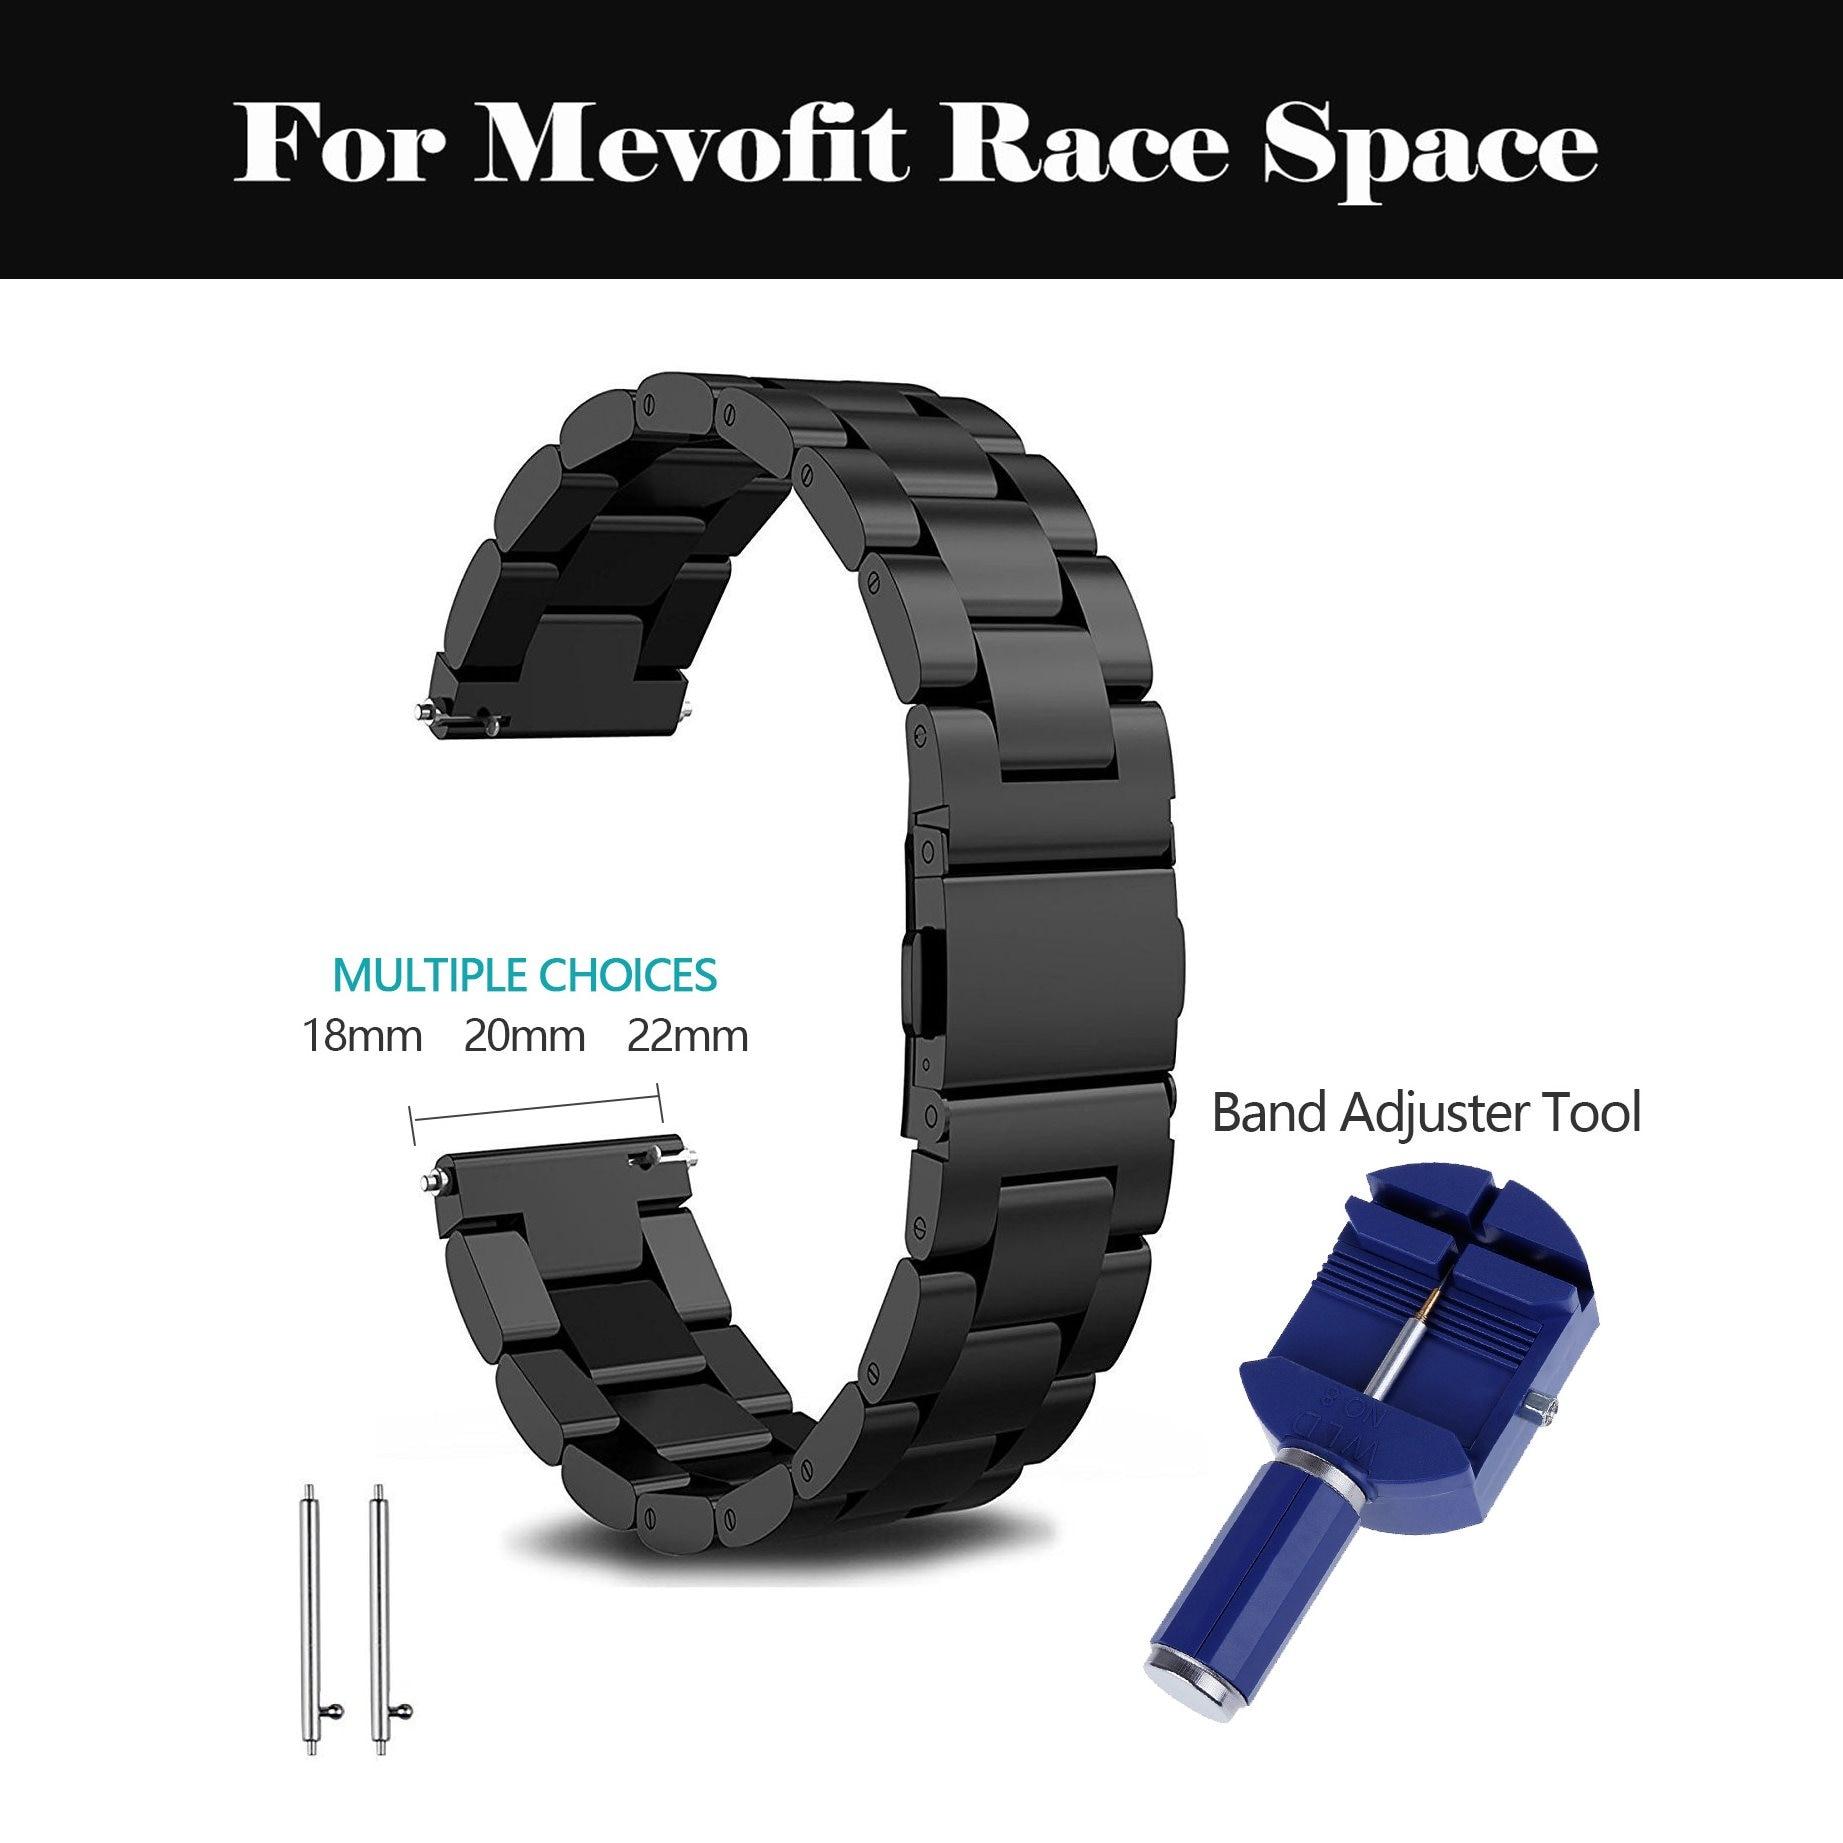 Correa de reloj de acero inoxidable 18mm 20mm 21mm 22mm 23mm 24mm correa de reloj de Metal relojes de pulsera para Mevofit Race Space